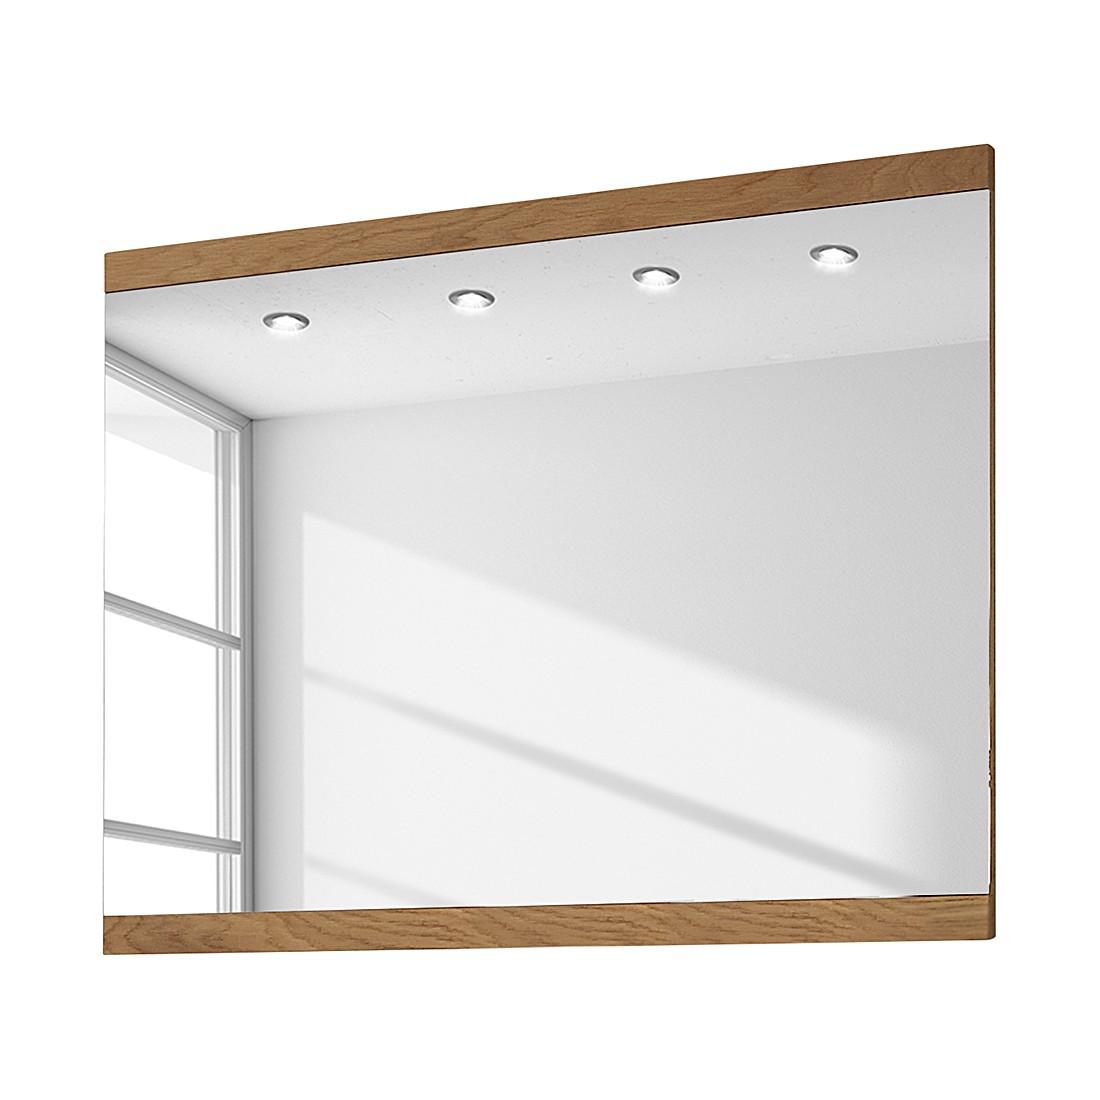 Miroir Allround III - Chêne sauvage brut de sciage - 99 x 80 cm, Voss